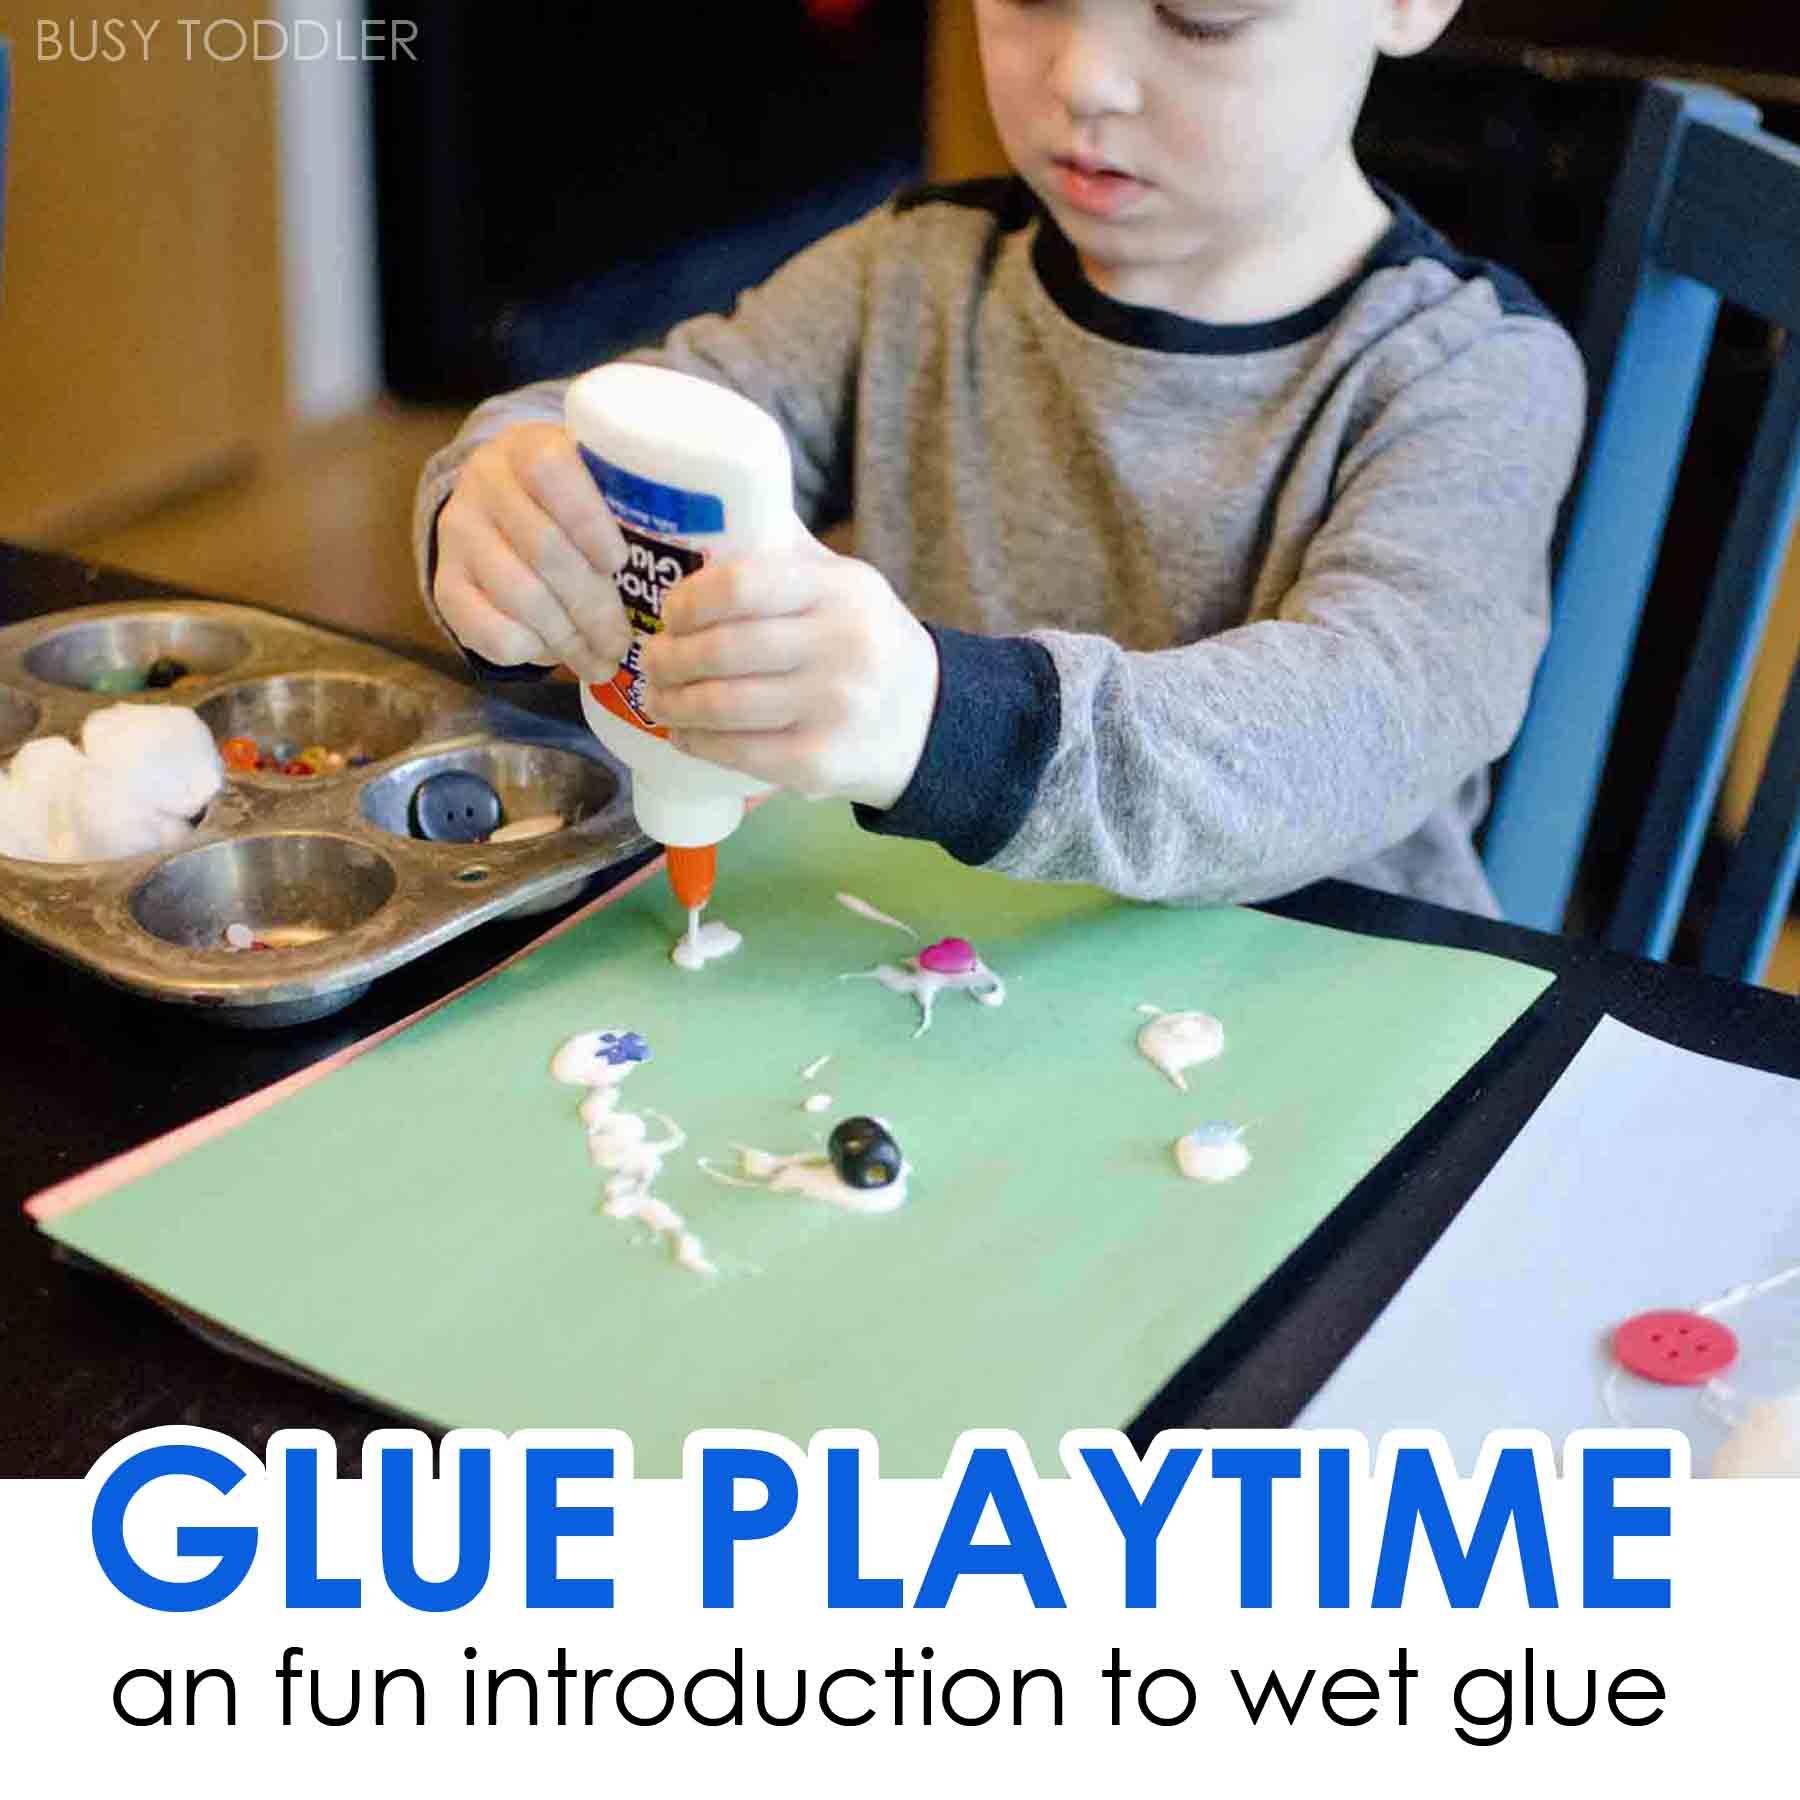 Glue Playtime Activity